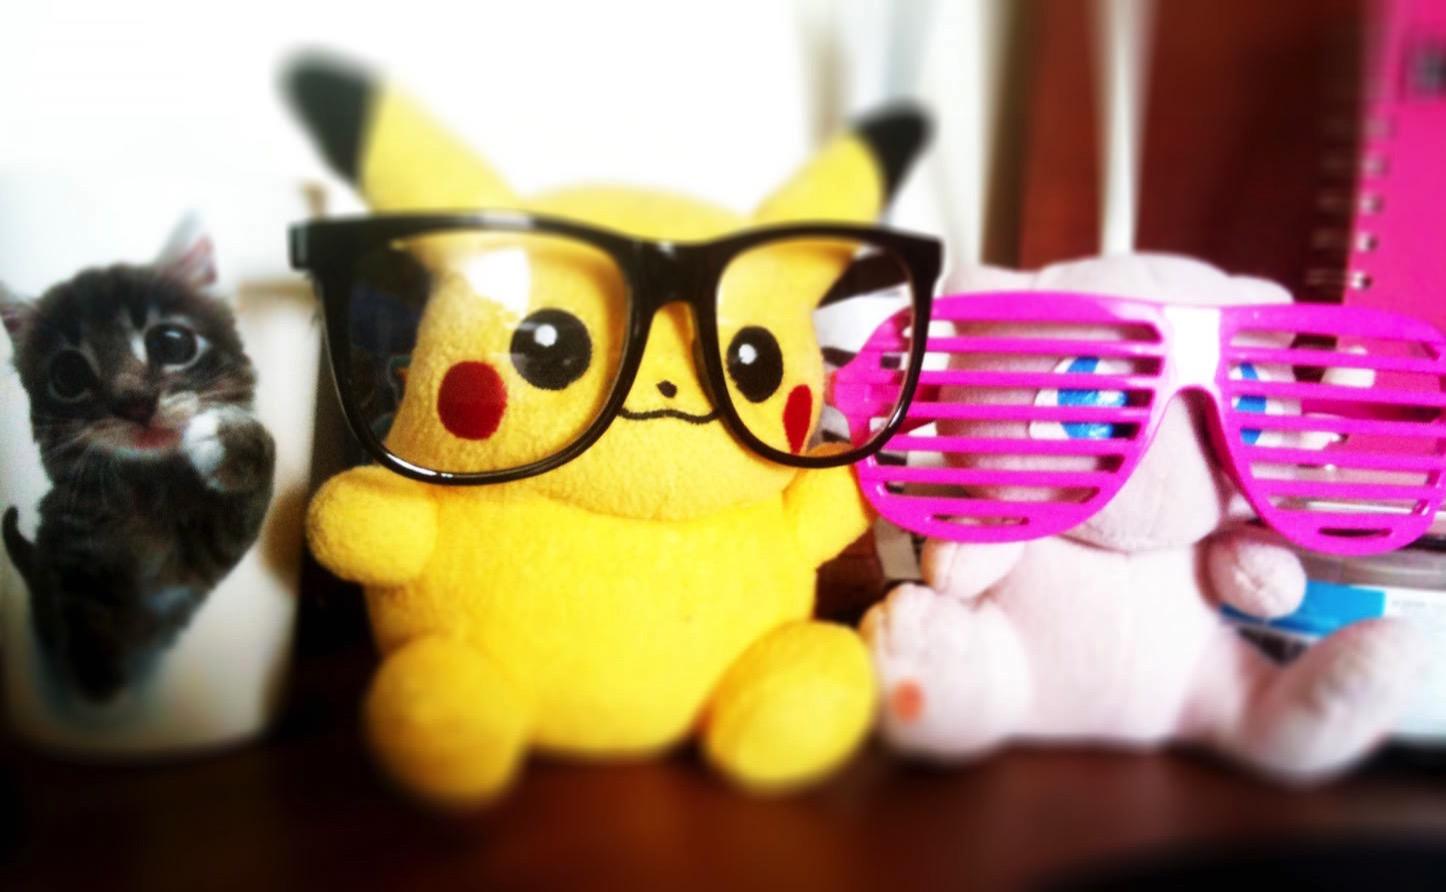 pikachu-wearing-glasses-pokemon.jpg